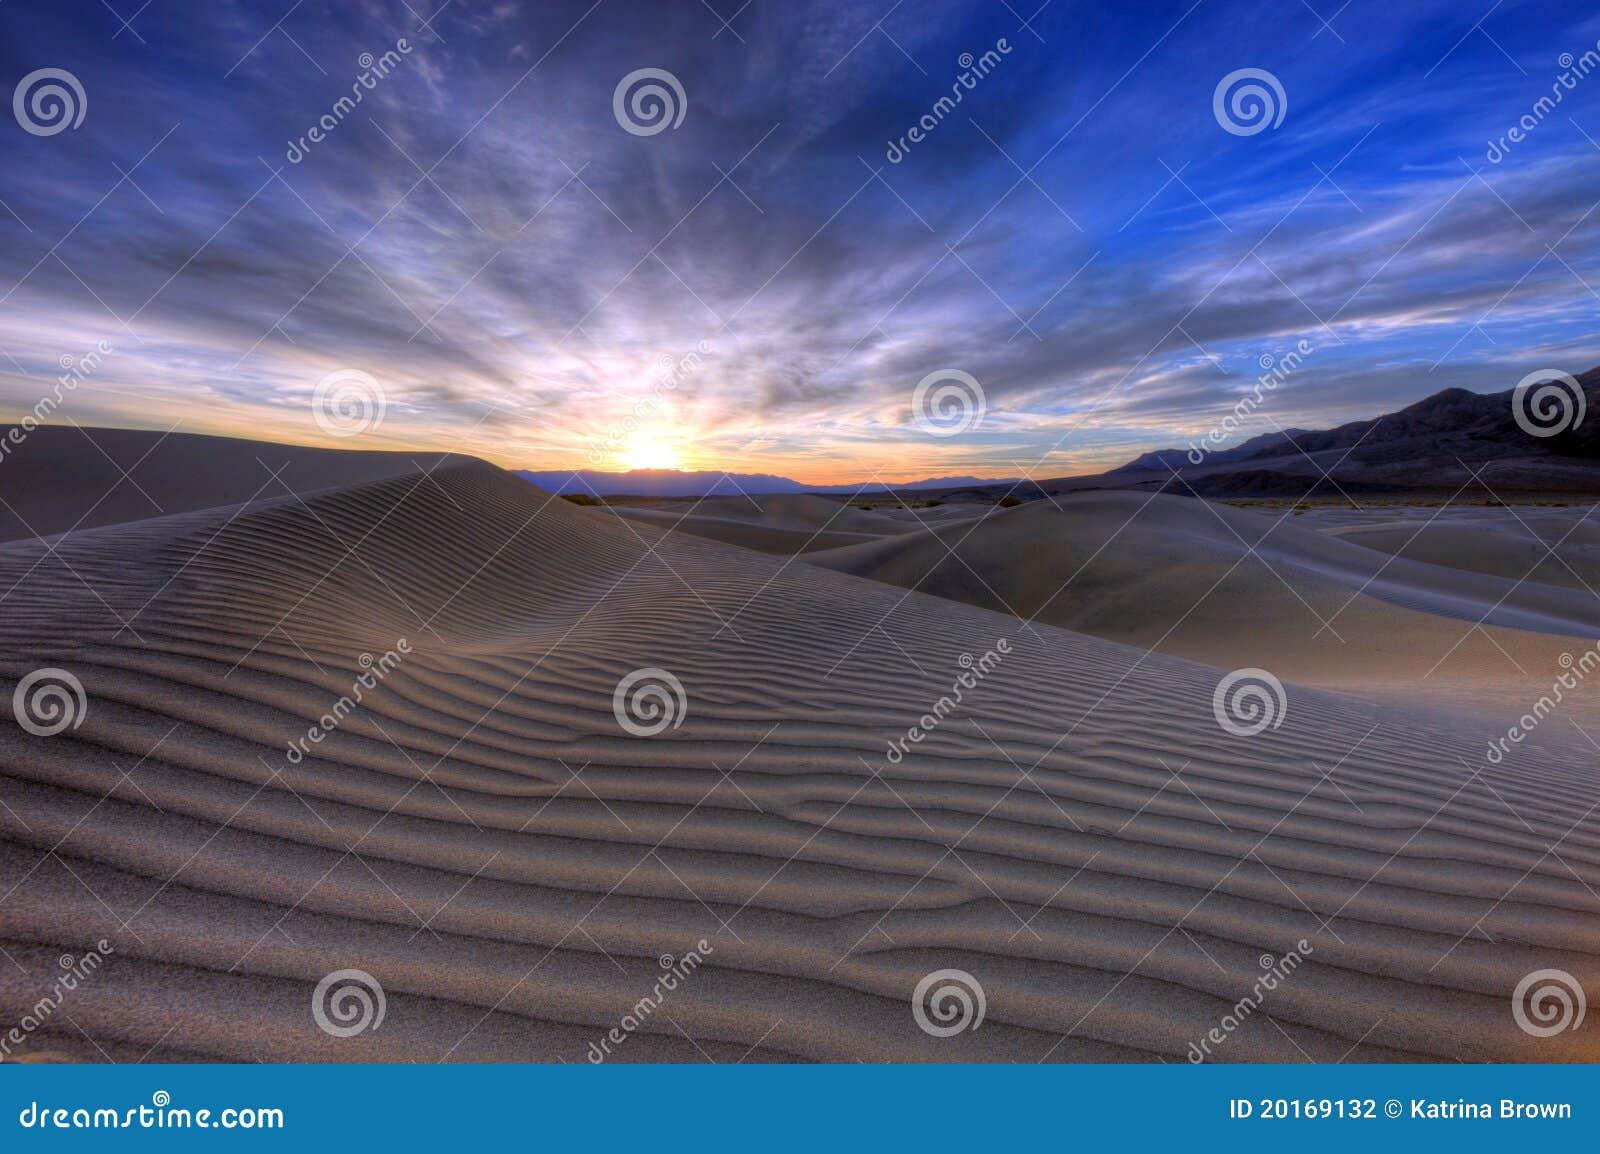 Sand Dune Landscape in Death Valley CA